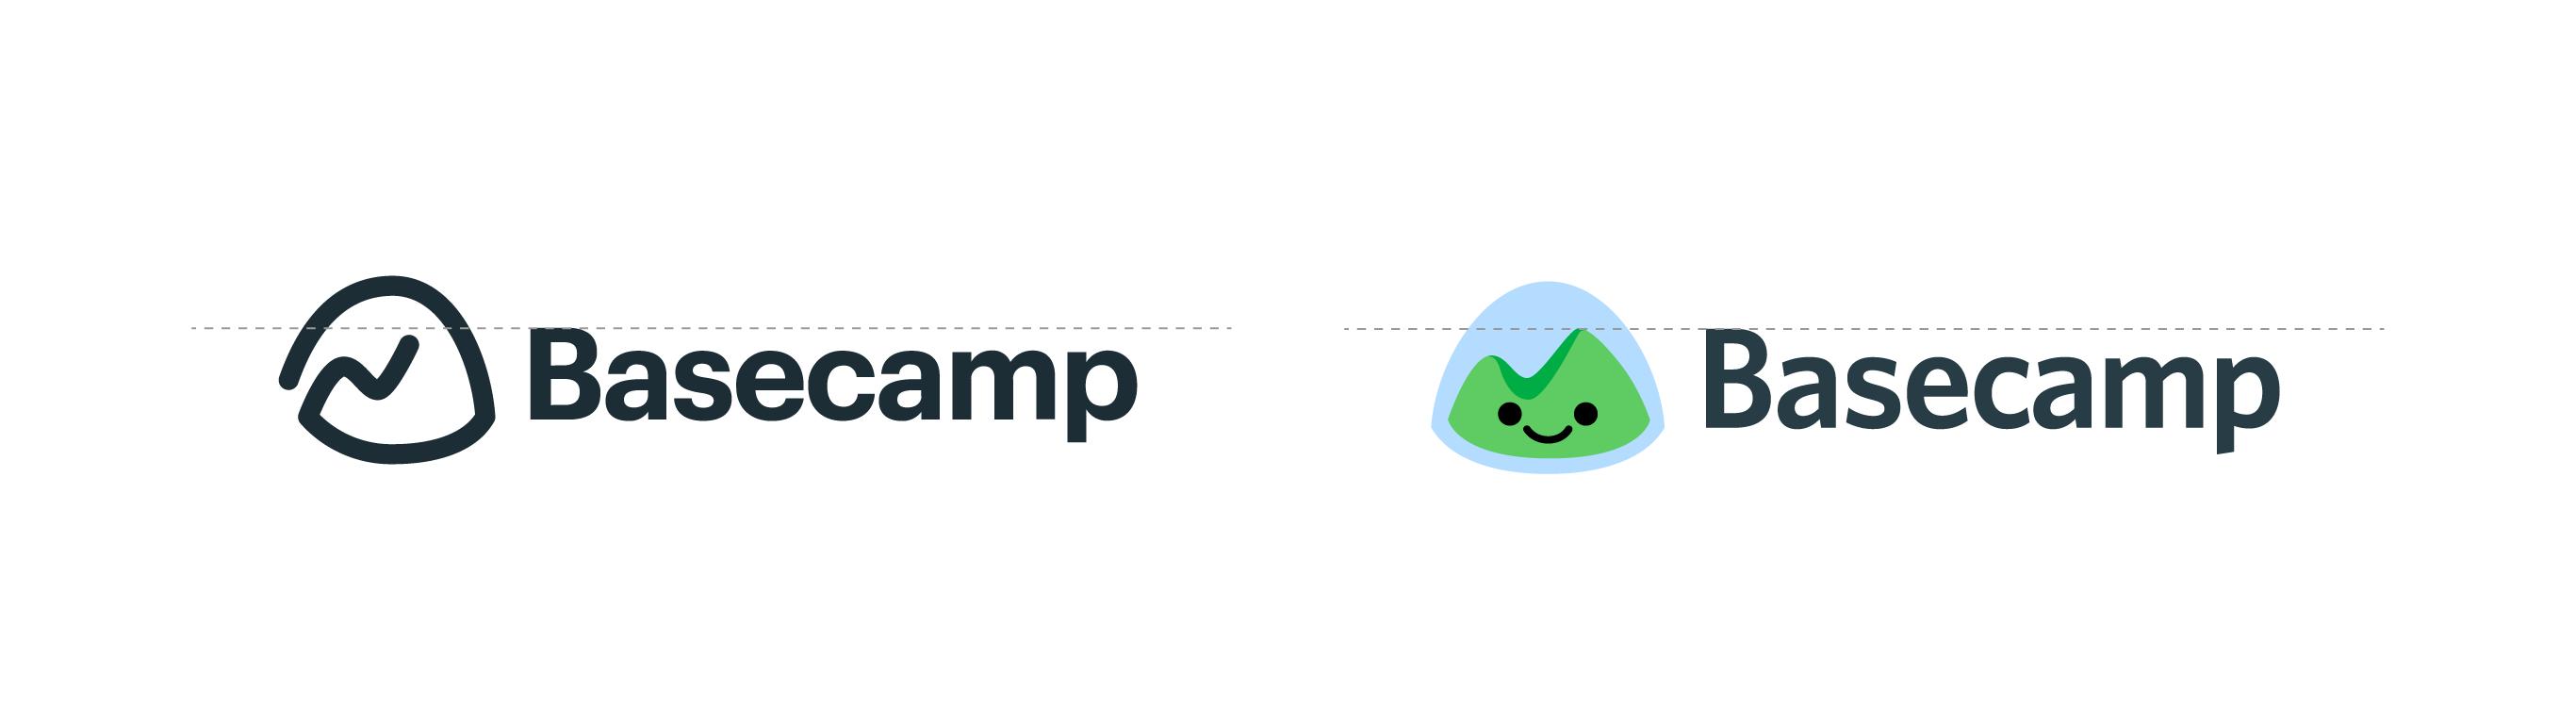 Basecamp logos: horizontal alignment